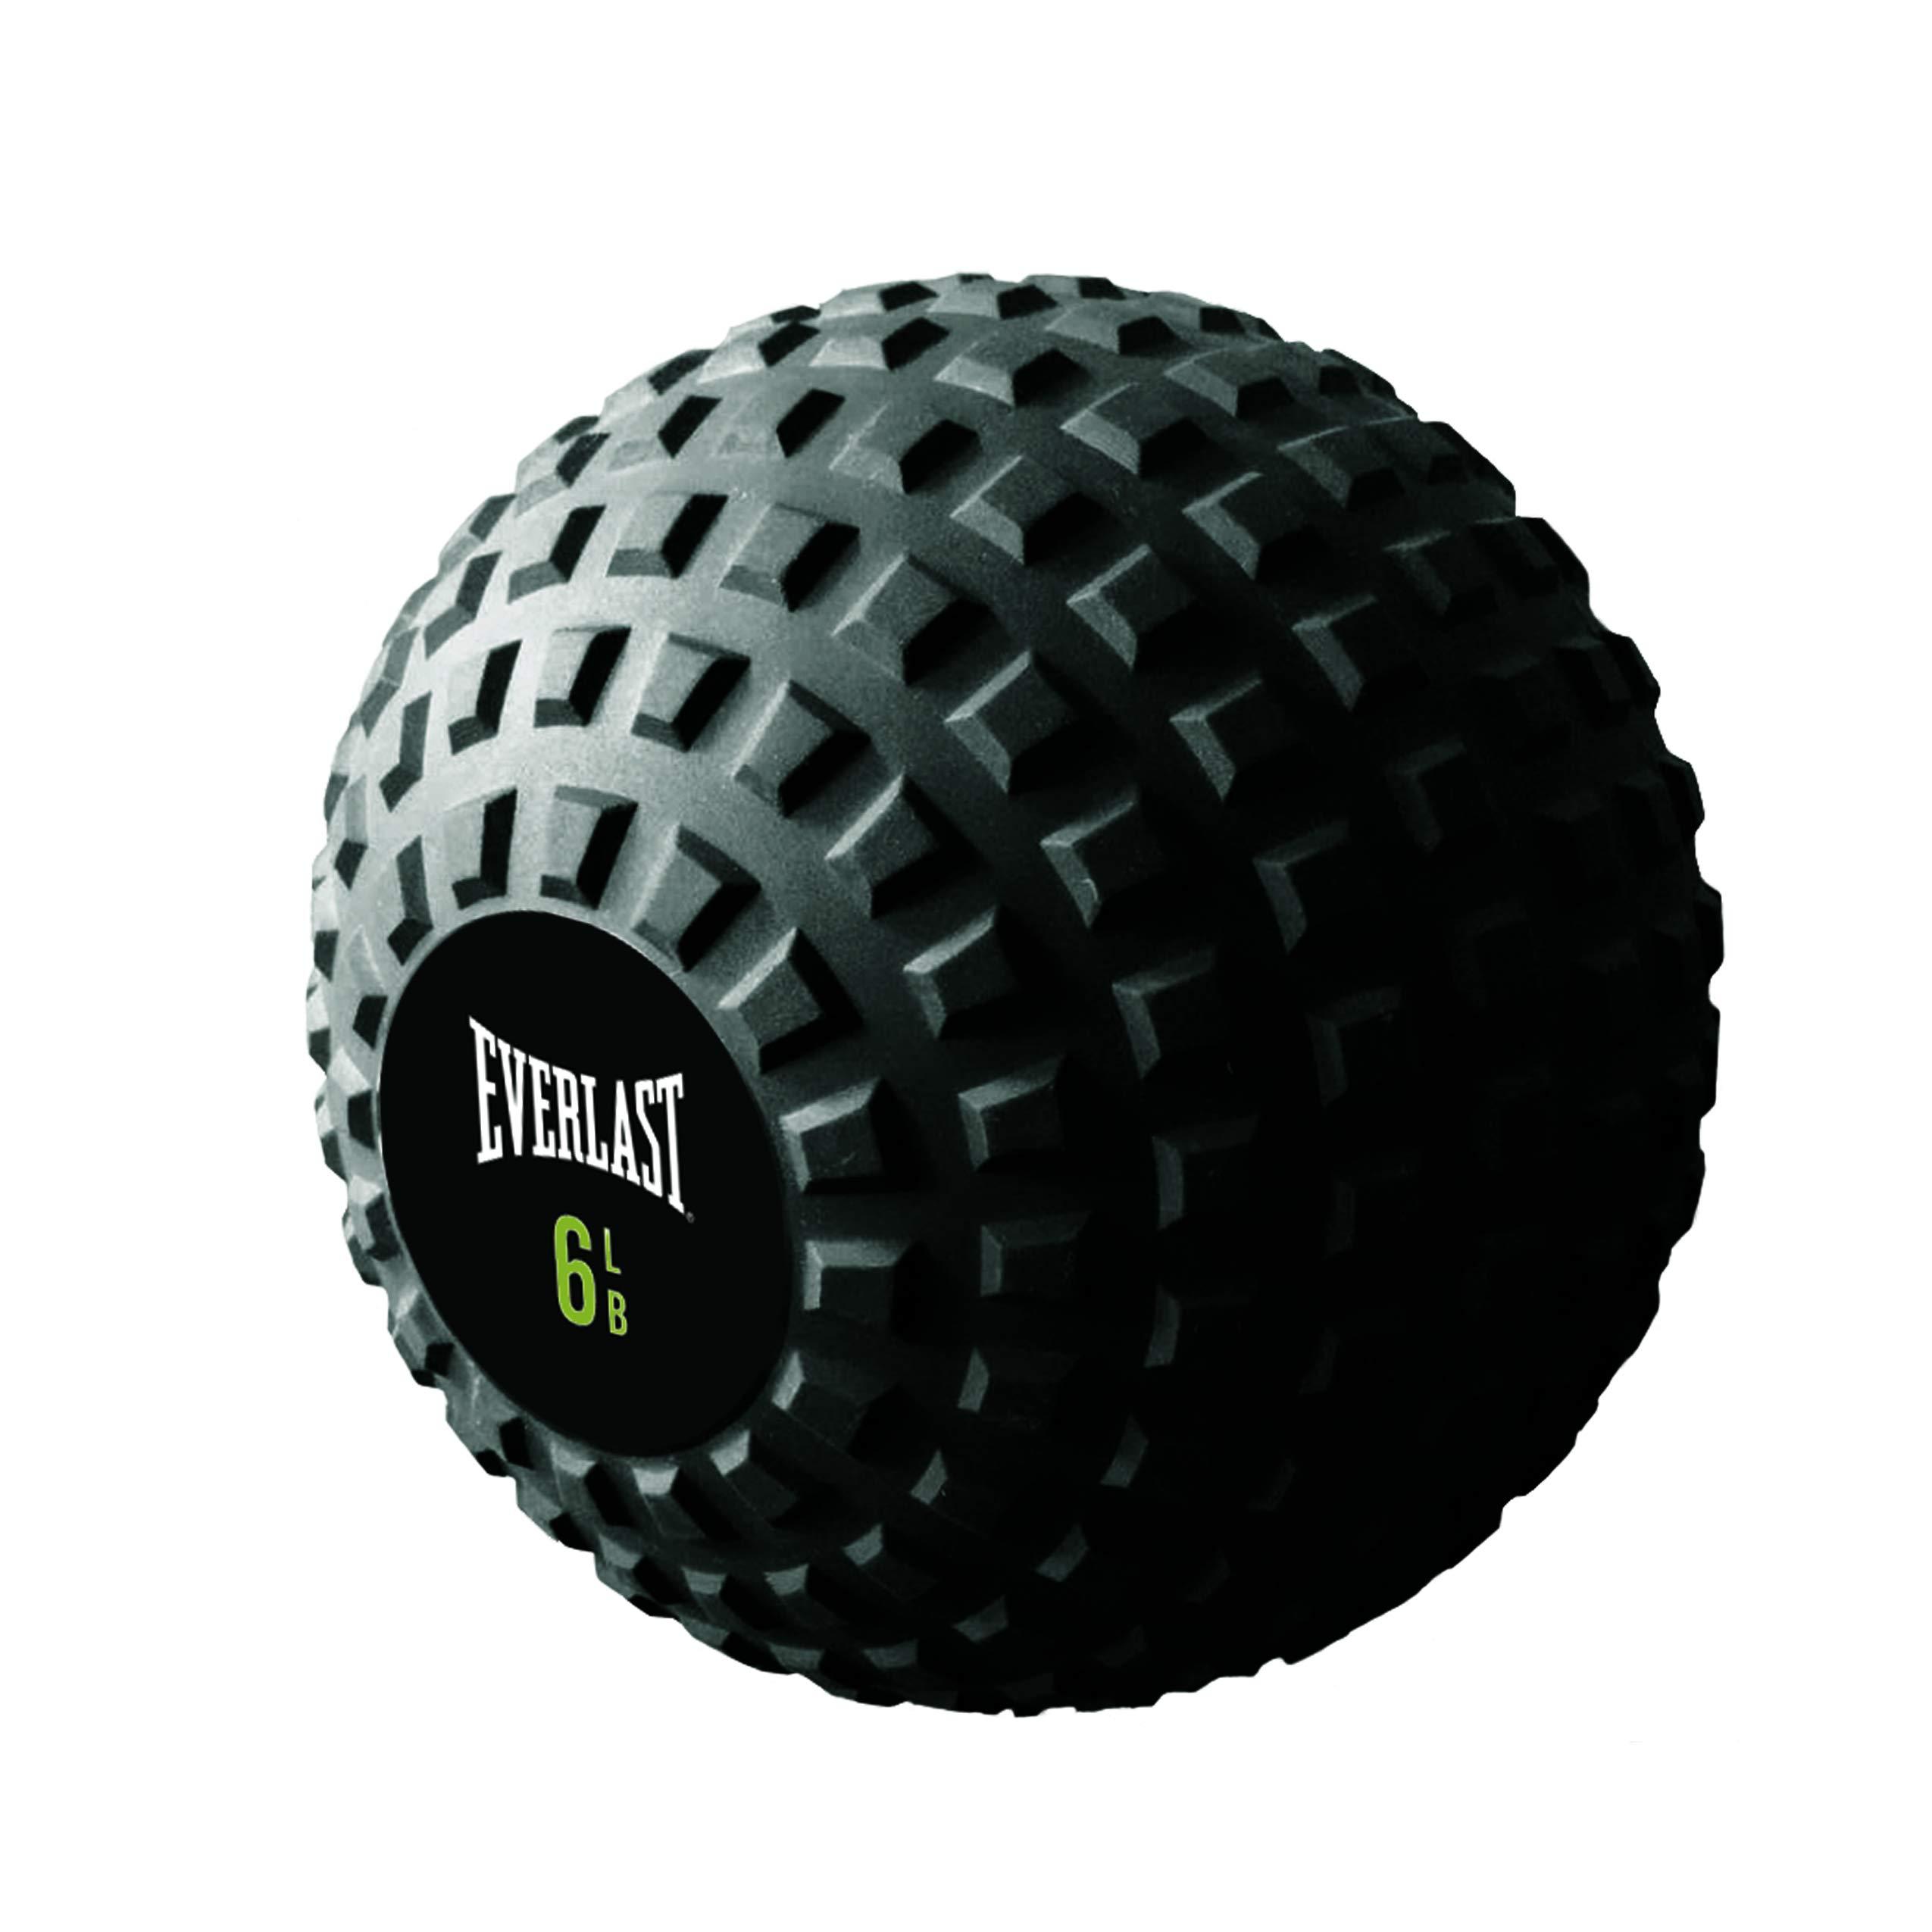 Everlast 6lb Textured Slam Ball Textured Slam Ball